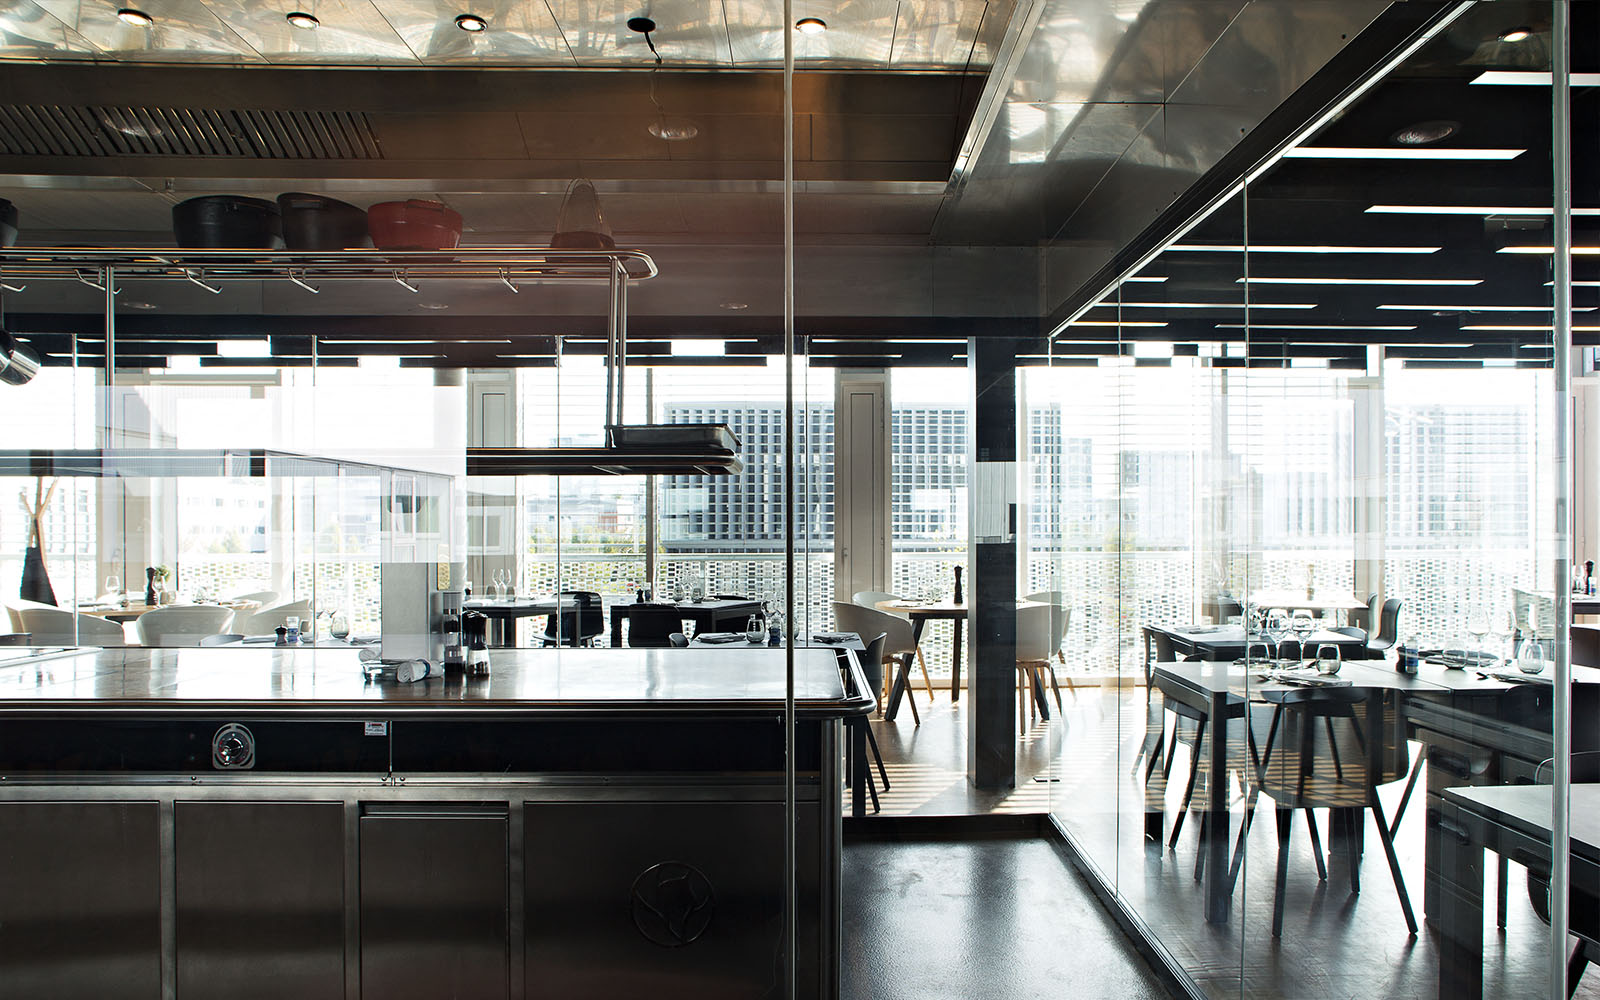 decoratrice interieur rennes gallery of porte interieur avec luminaire design cuisine inspirer. Black Bedroom Furniture Sets. Home Design Ideas